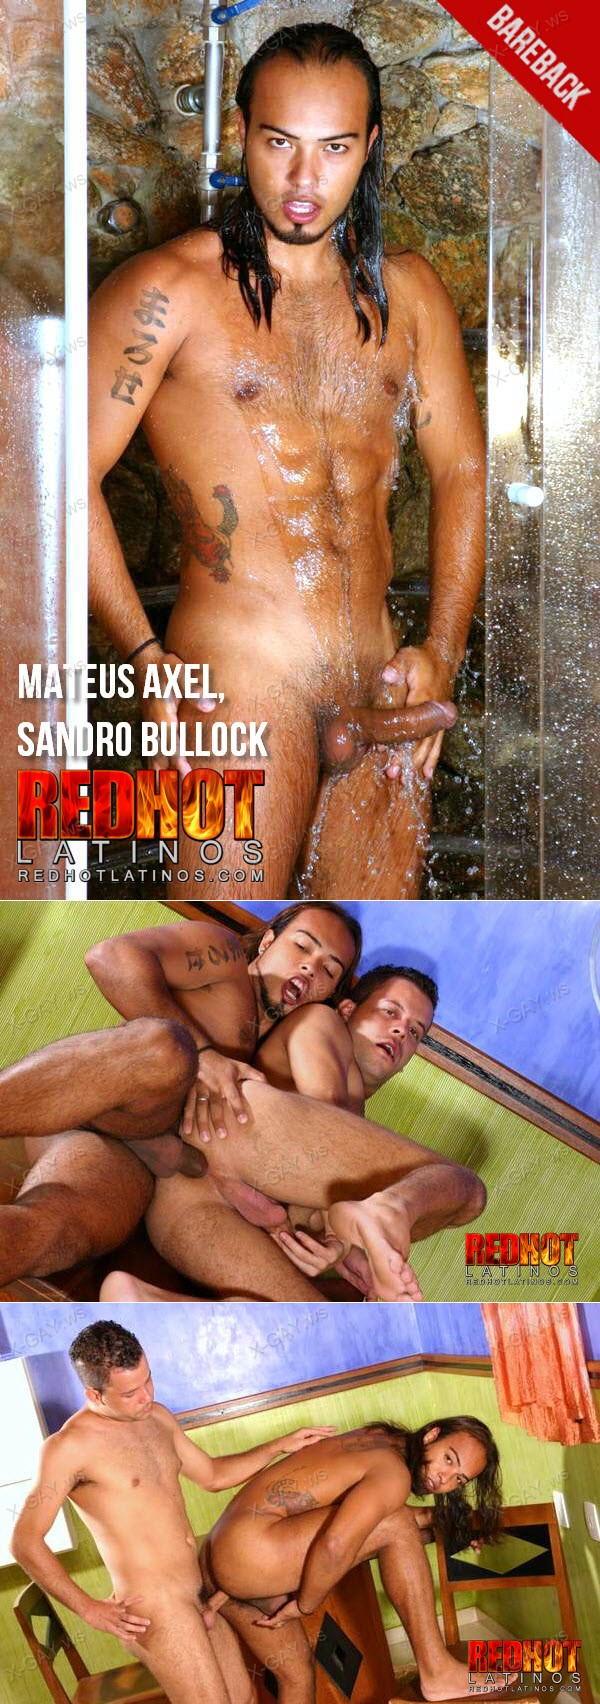 redhotlatinos_mateusaxel_sandrobullock.jpg